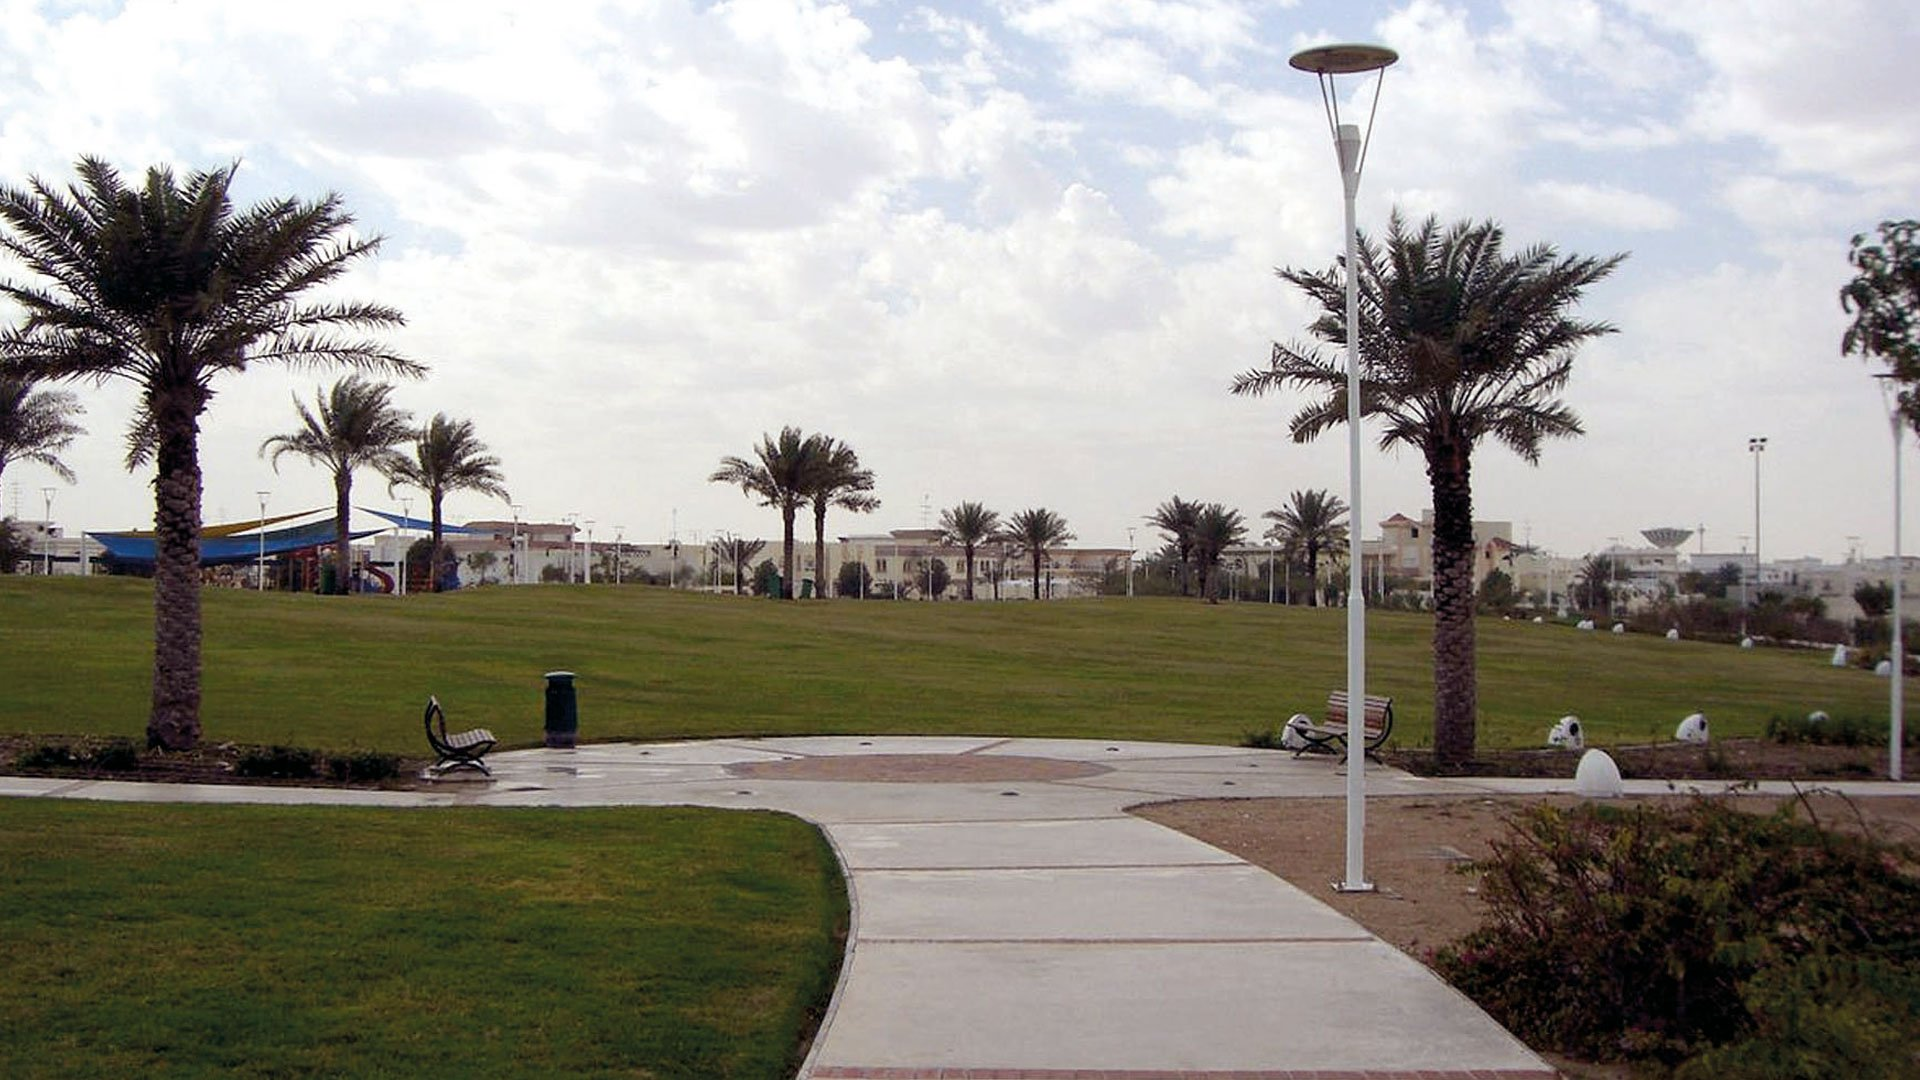 Dahl Al Hamam Park to be closed for maintenance